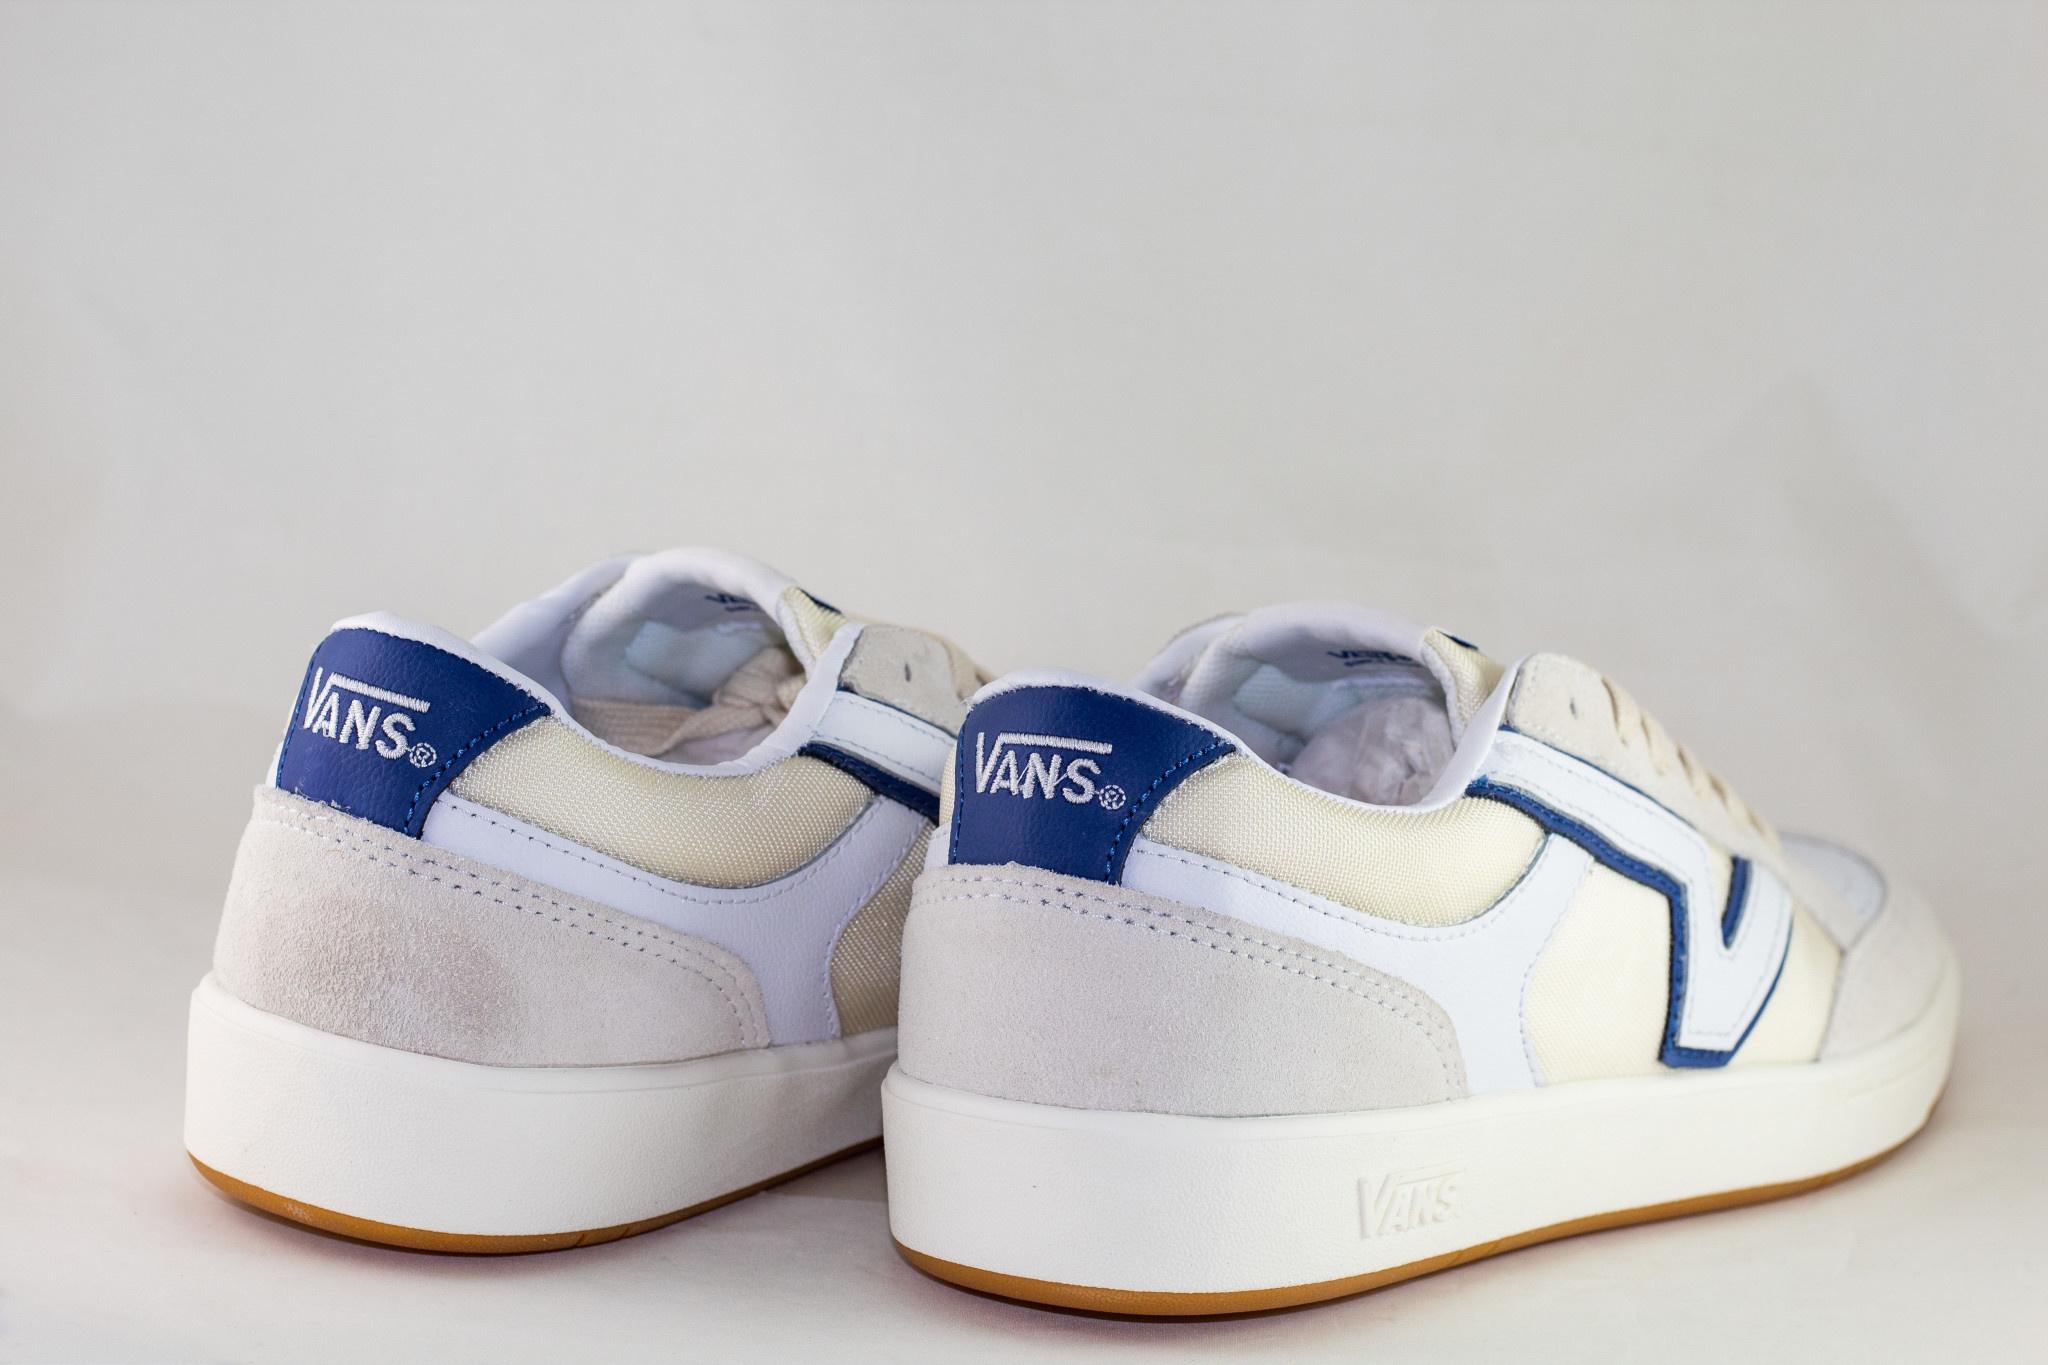 VANS LOWLAND CC  (Serio Collection) White/ True Navy